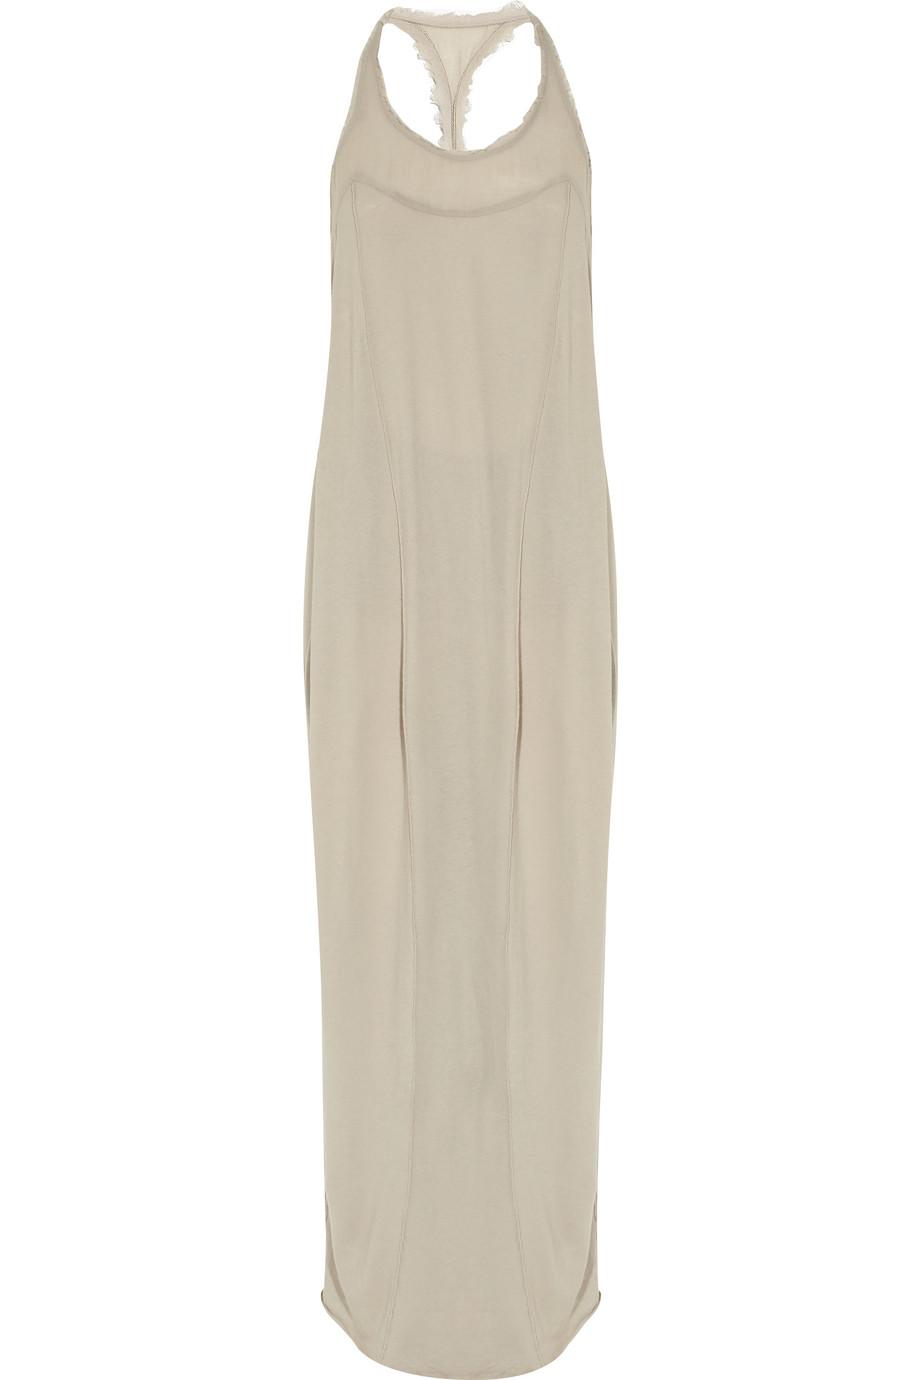 Raquel allegra Frayed Cotton-gauze Maxi Dress in Gray  Lyst